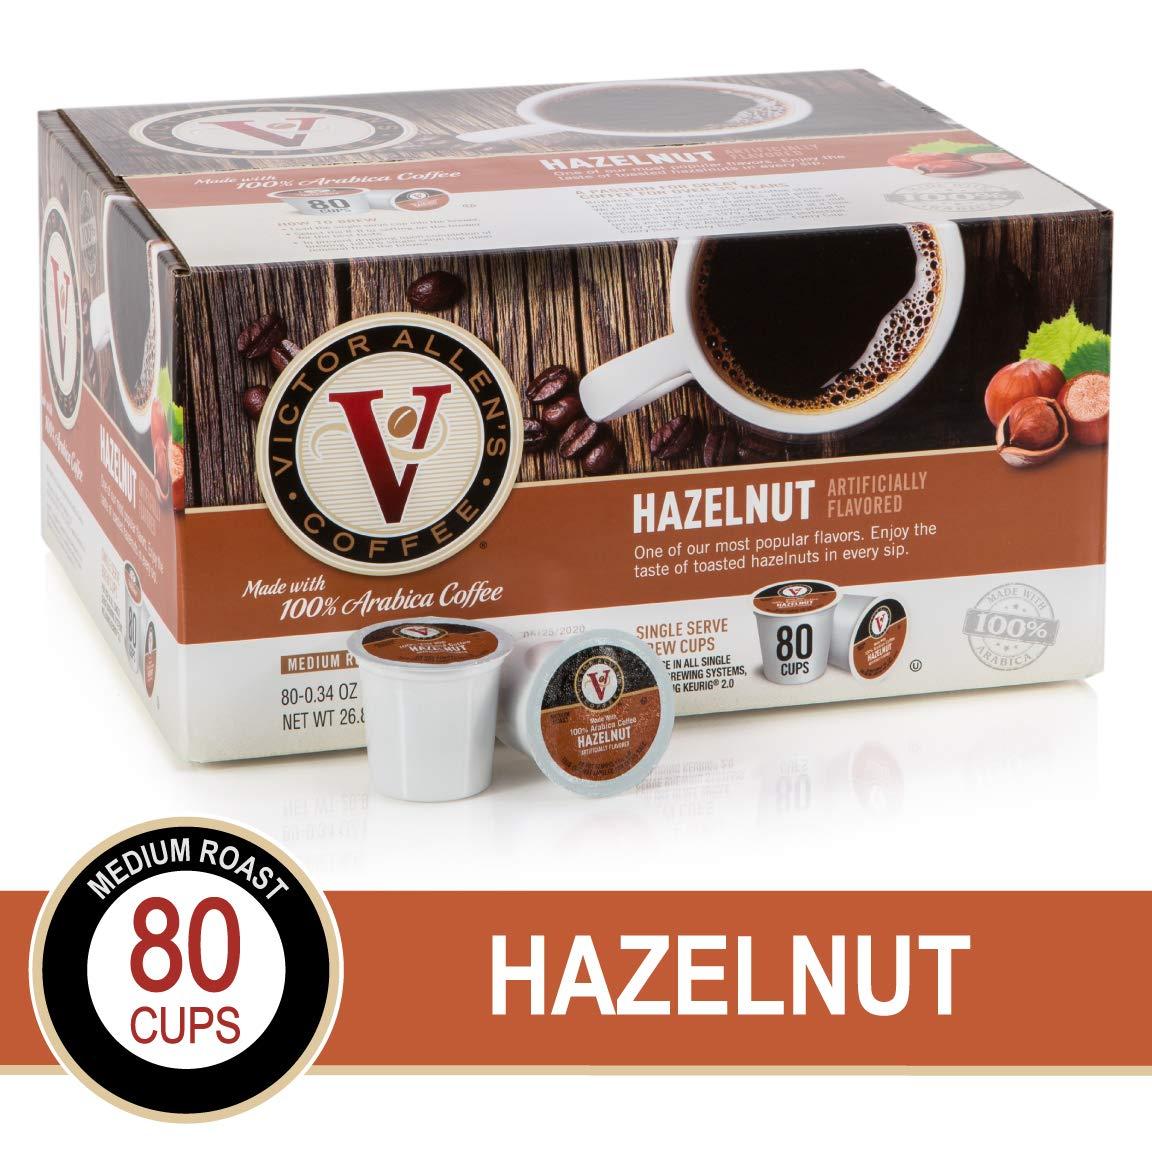 Hazelnut for K-Cup Keurig 2.0 Brewers, 80 Count, Victor Allen's Coffee Medium Roast Single Serve Coffee Pods by Victor Allen